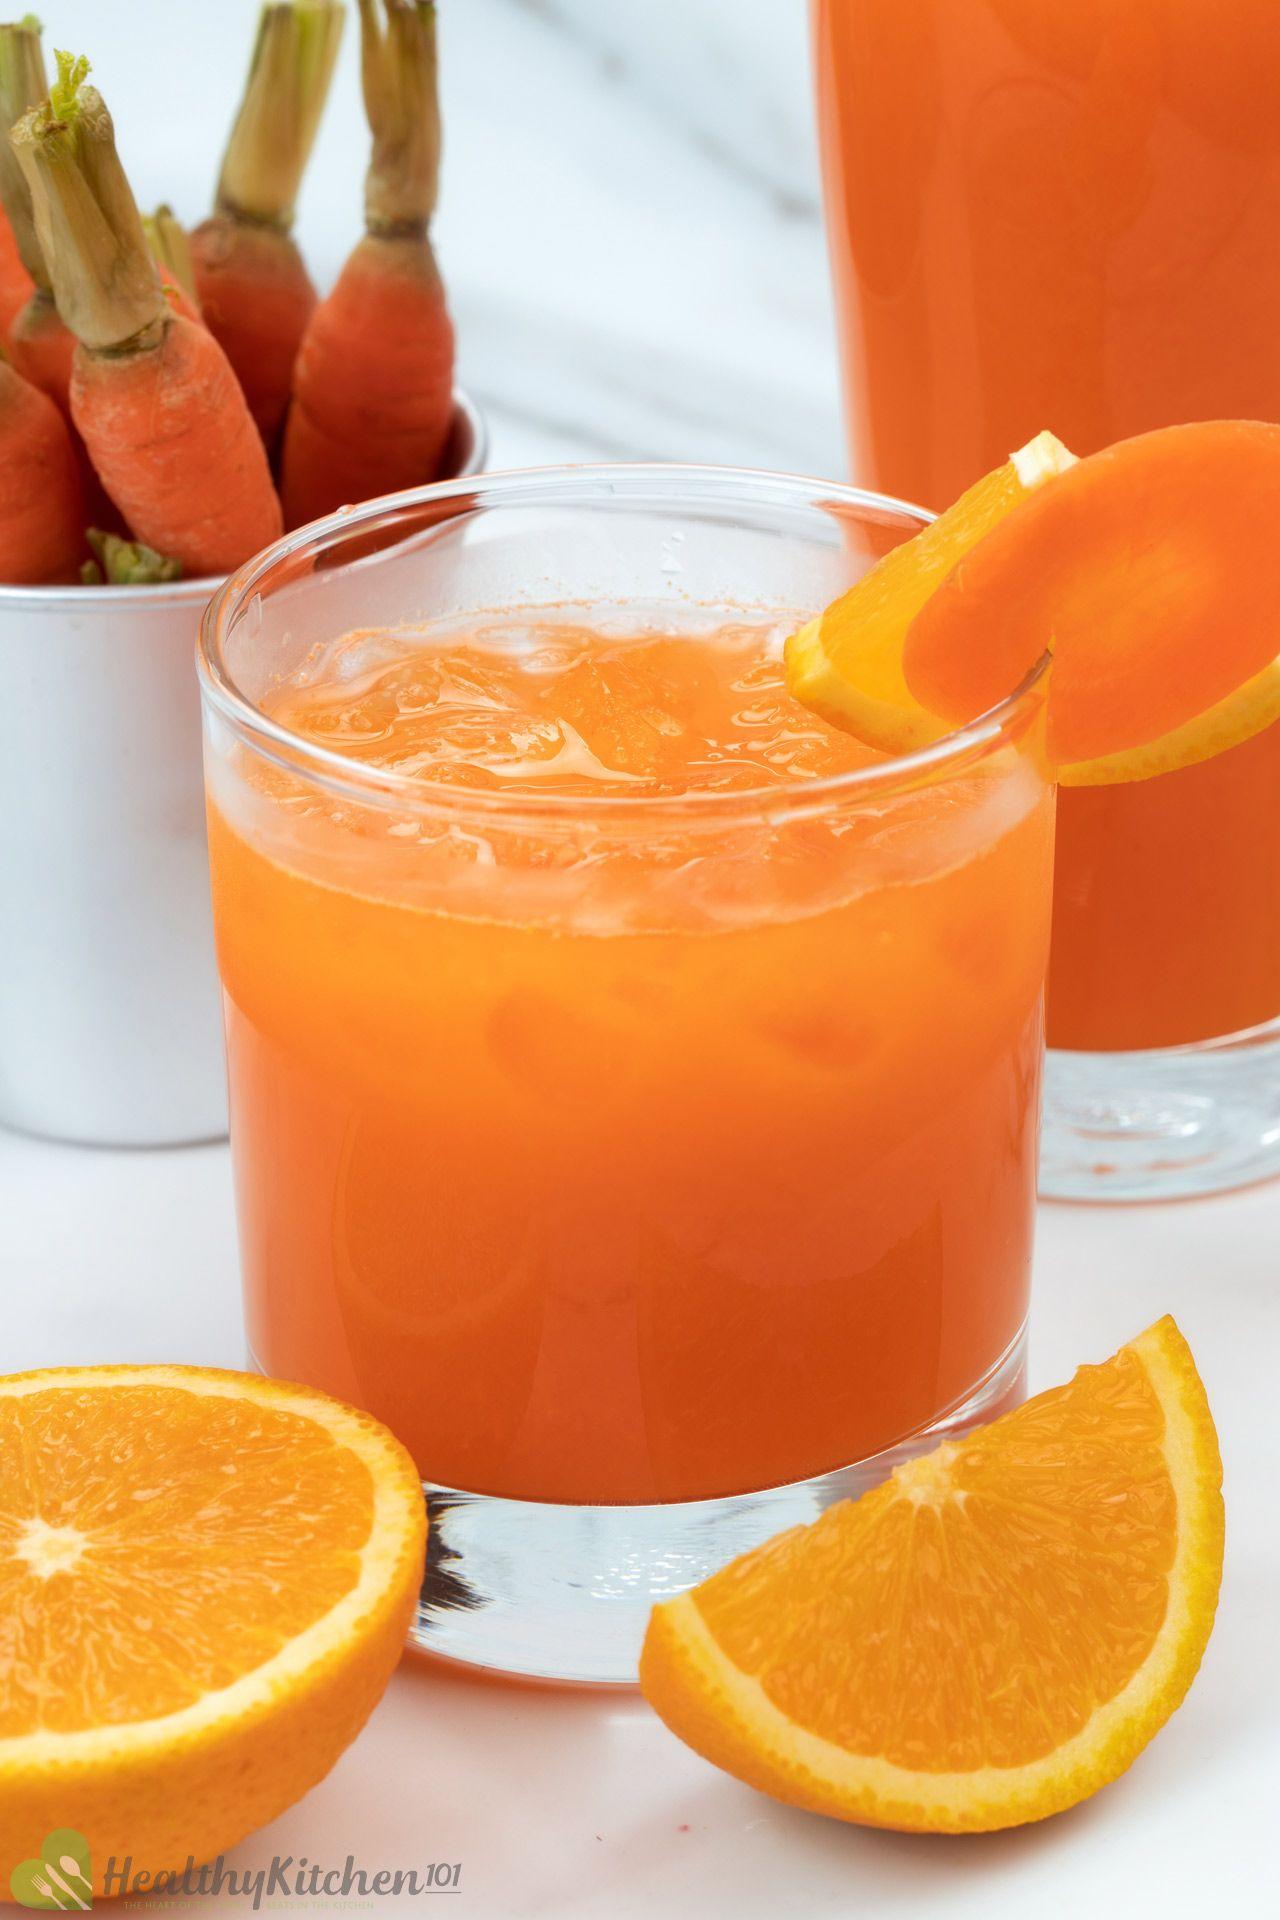 benefits of Carrot Orange Juice Recipe